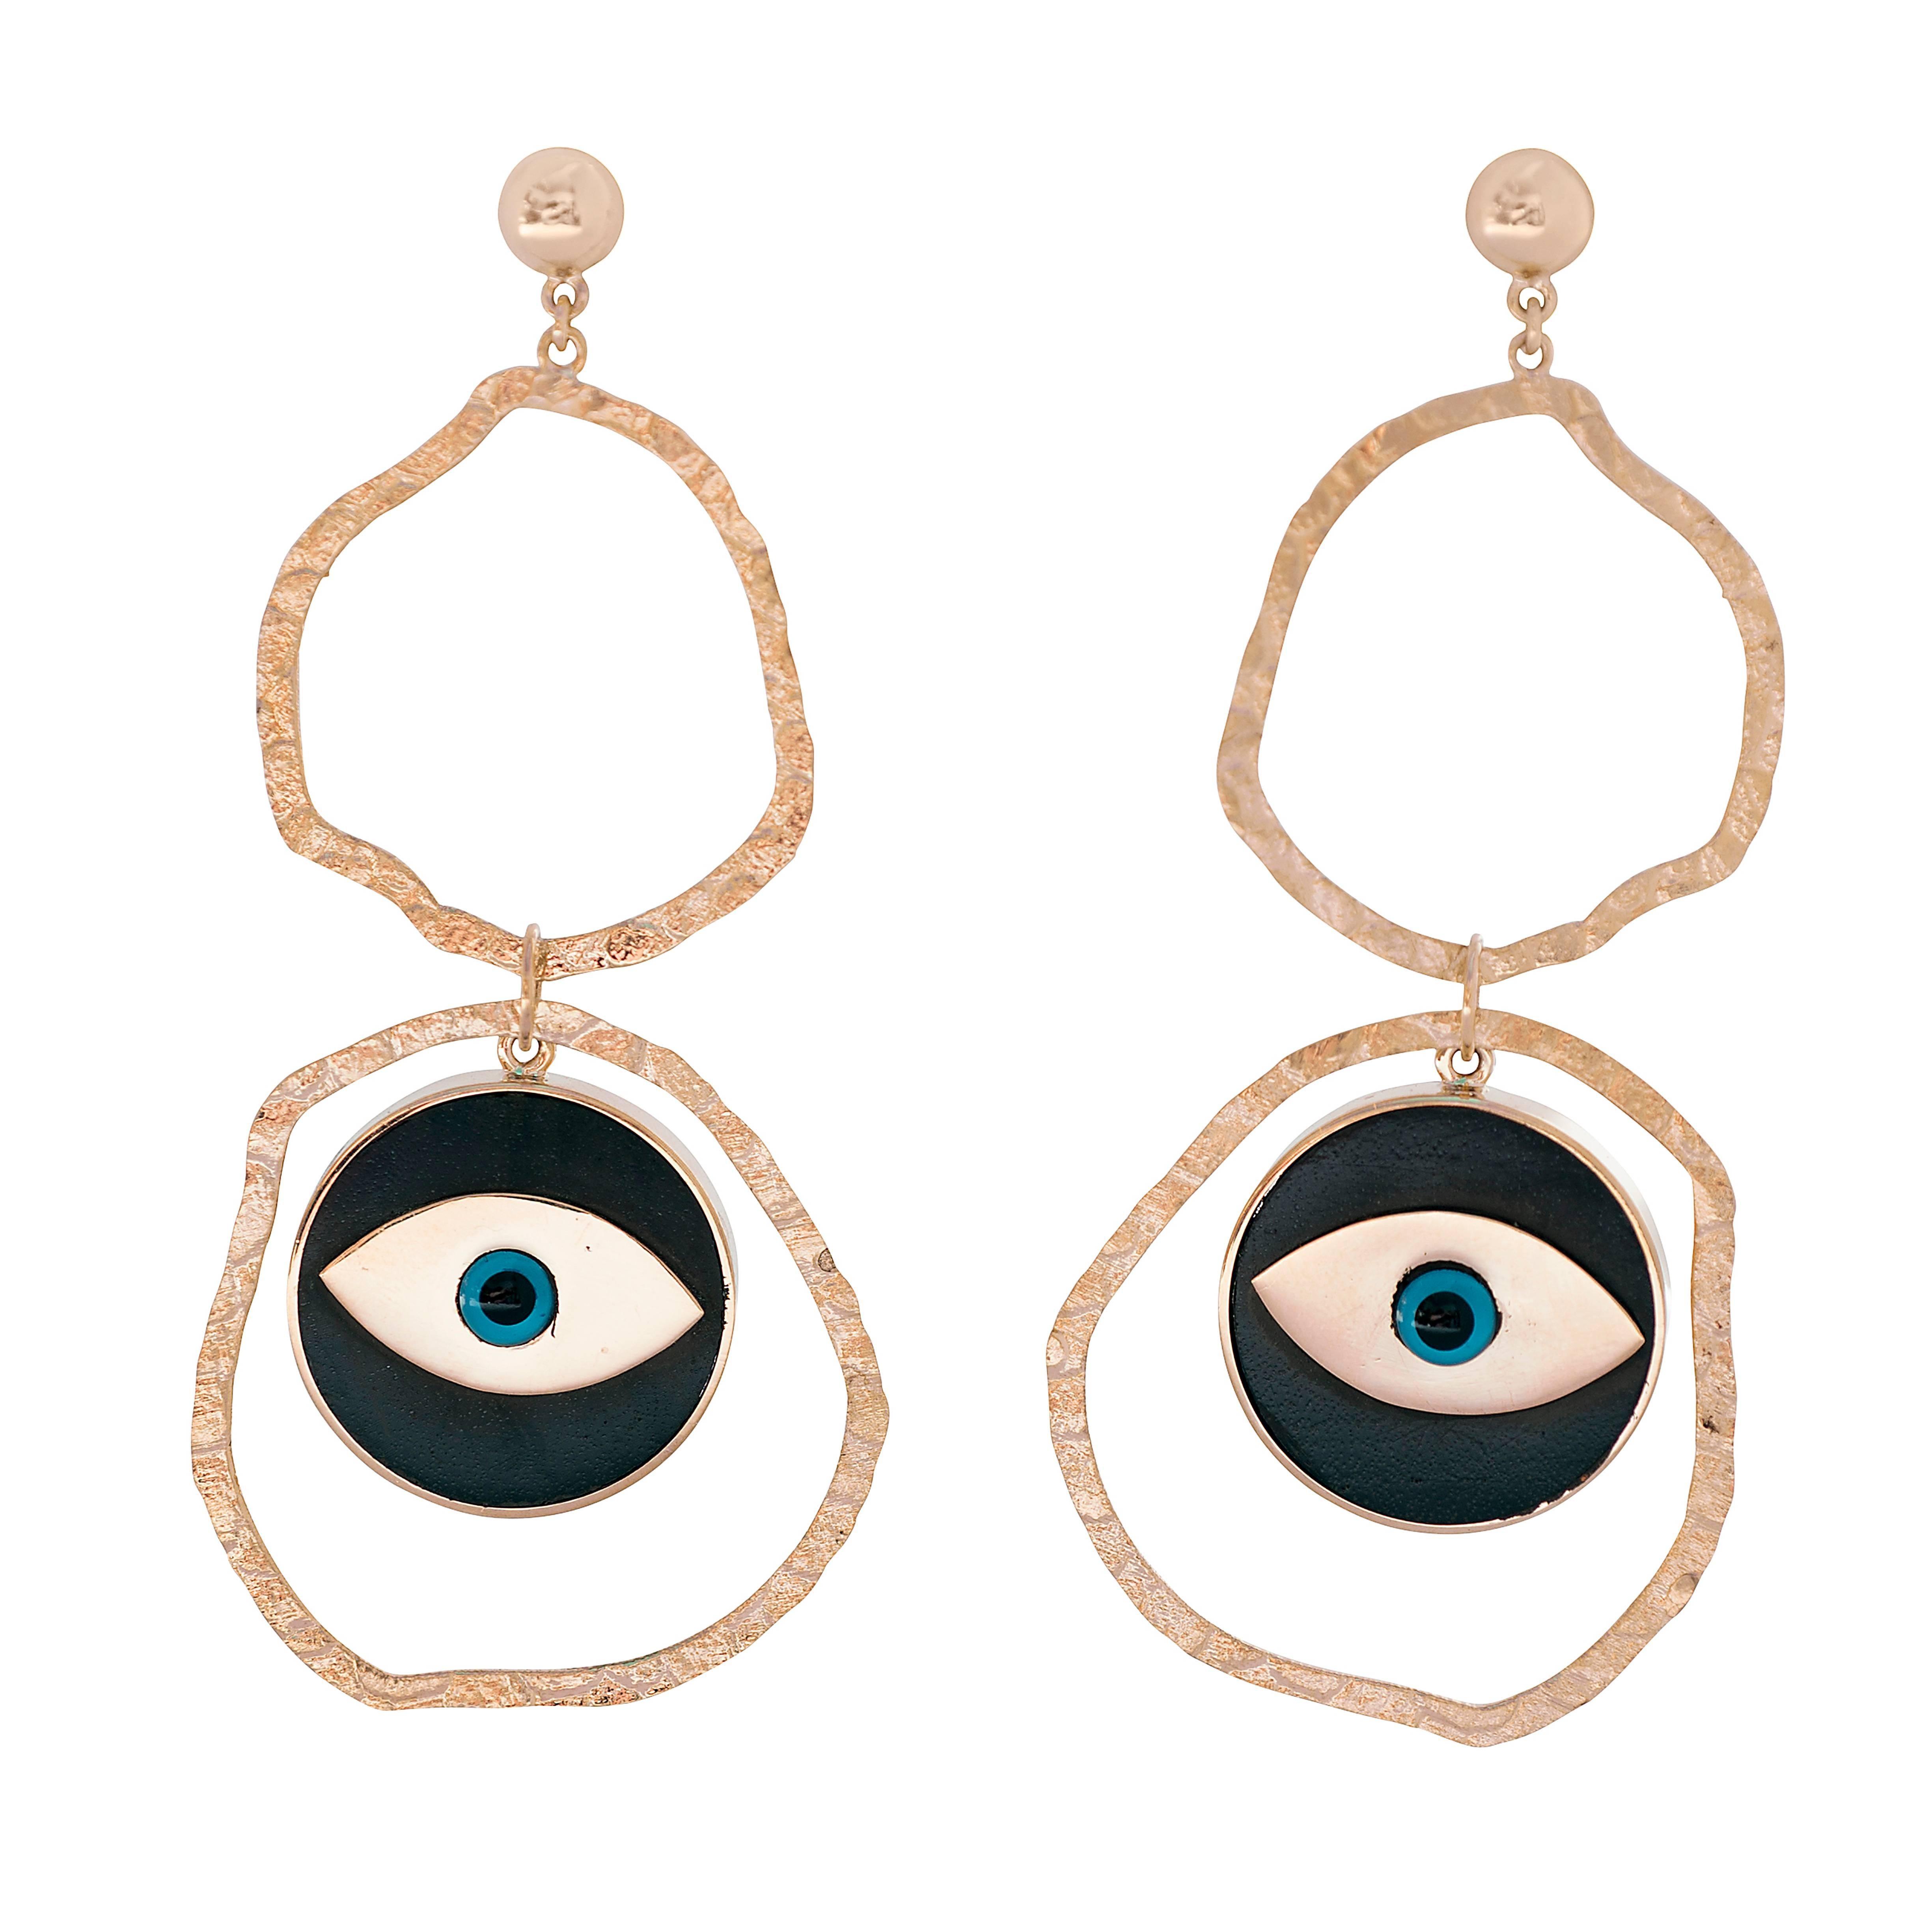 Clarissa Bronfman Gold and Ebony Double Hoop Earrings